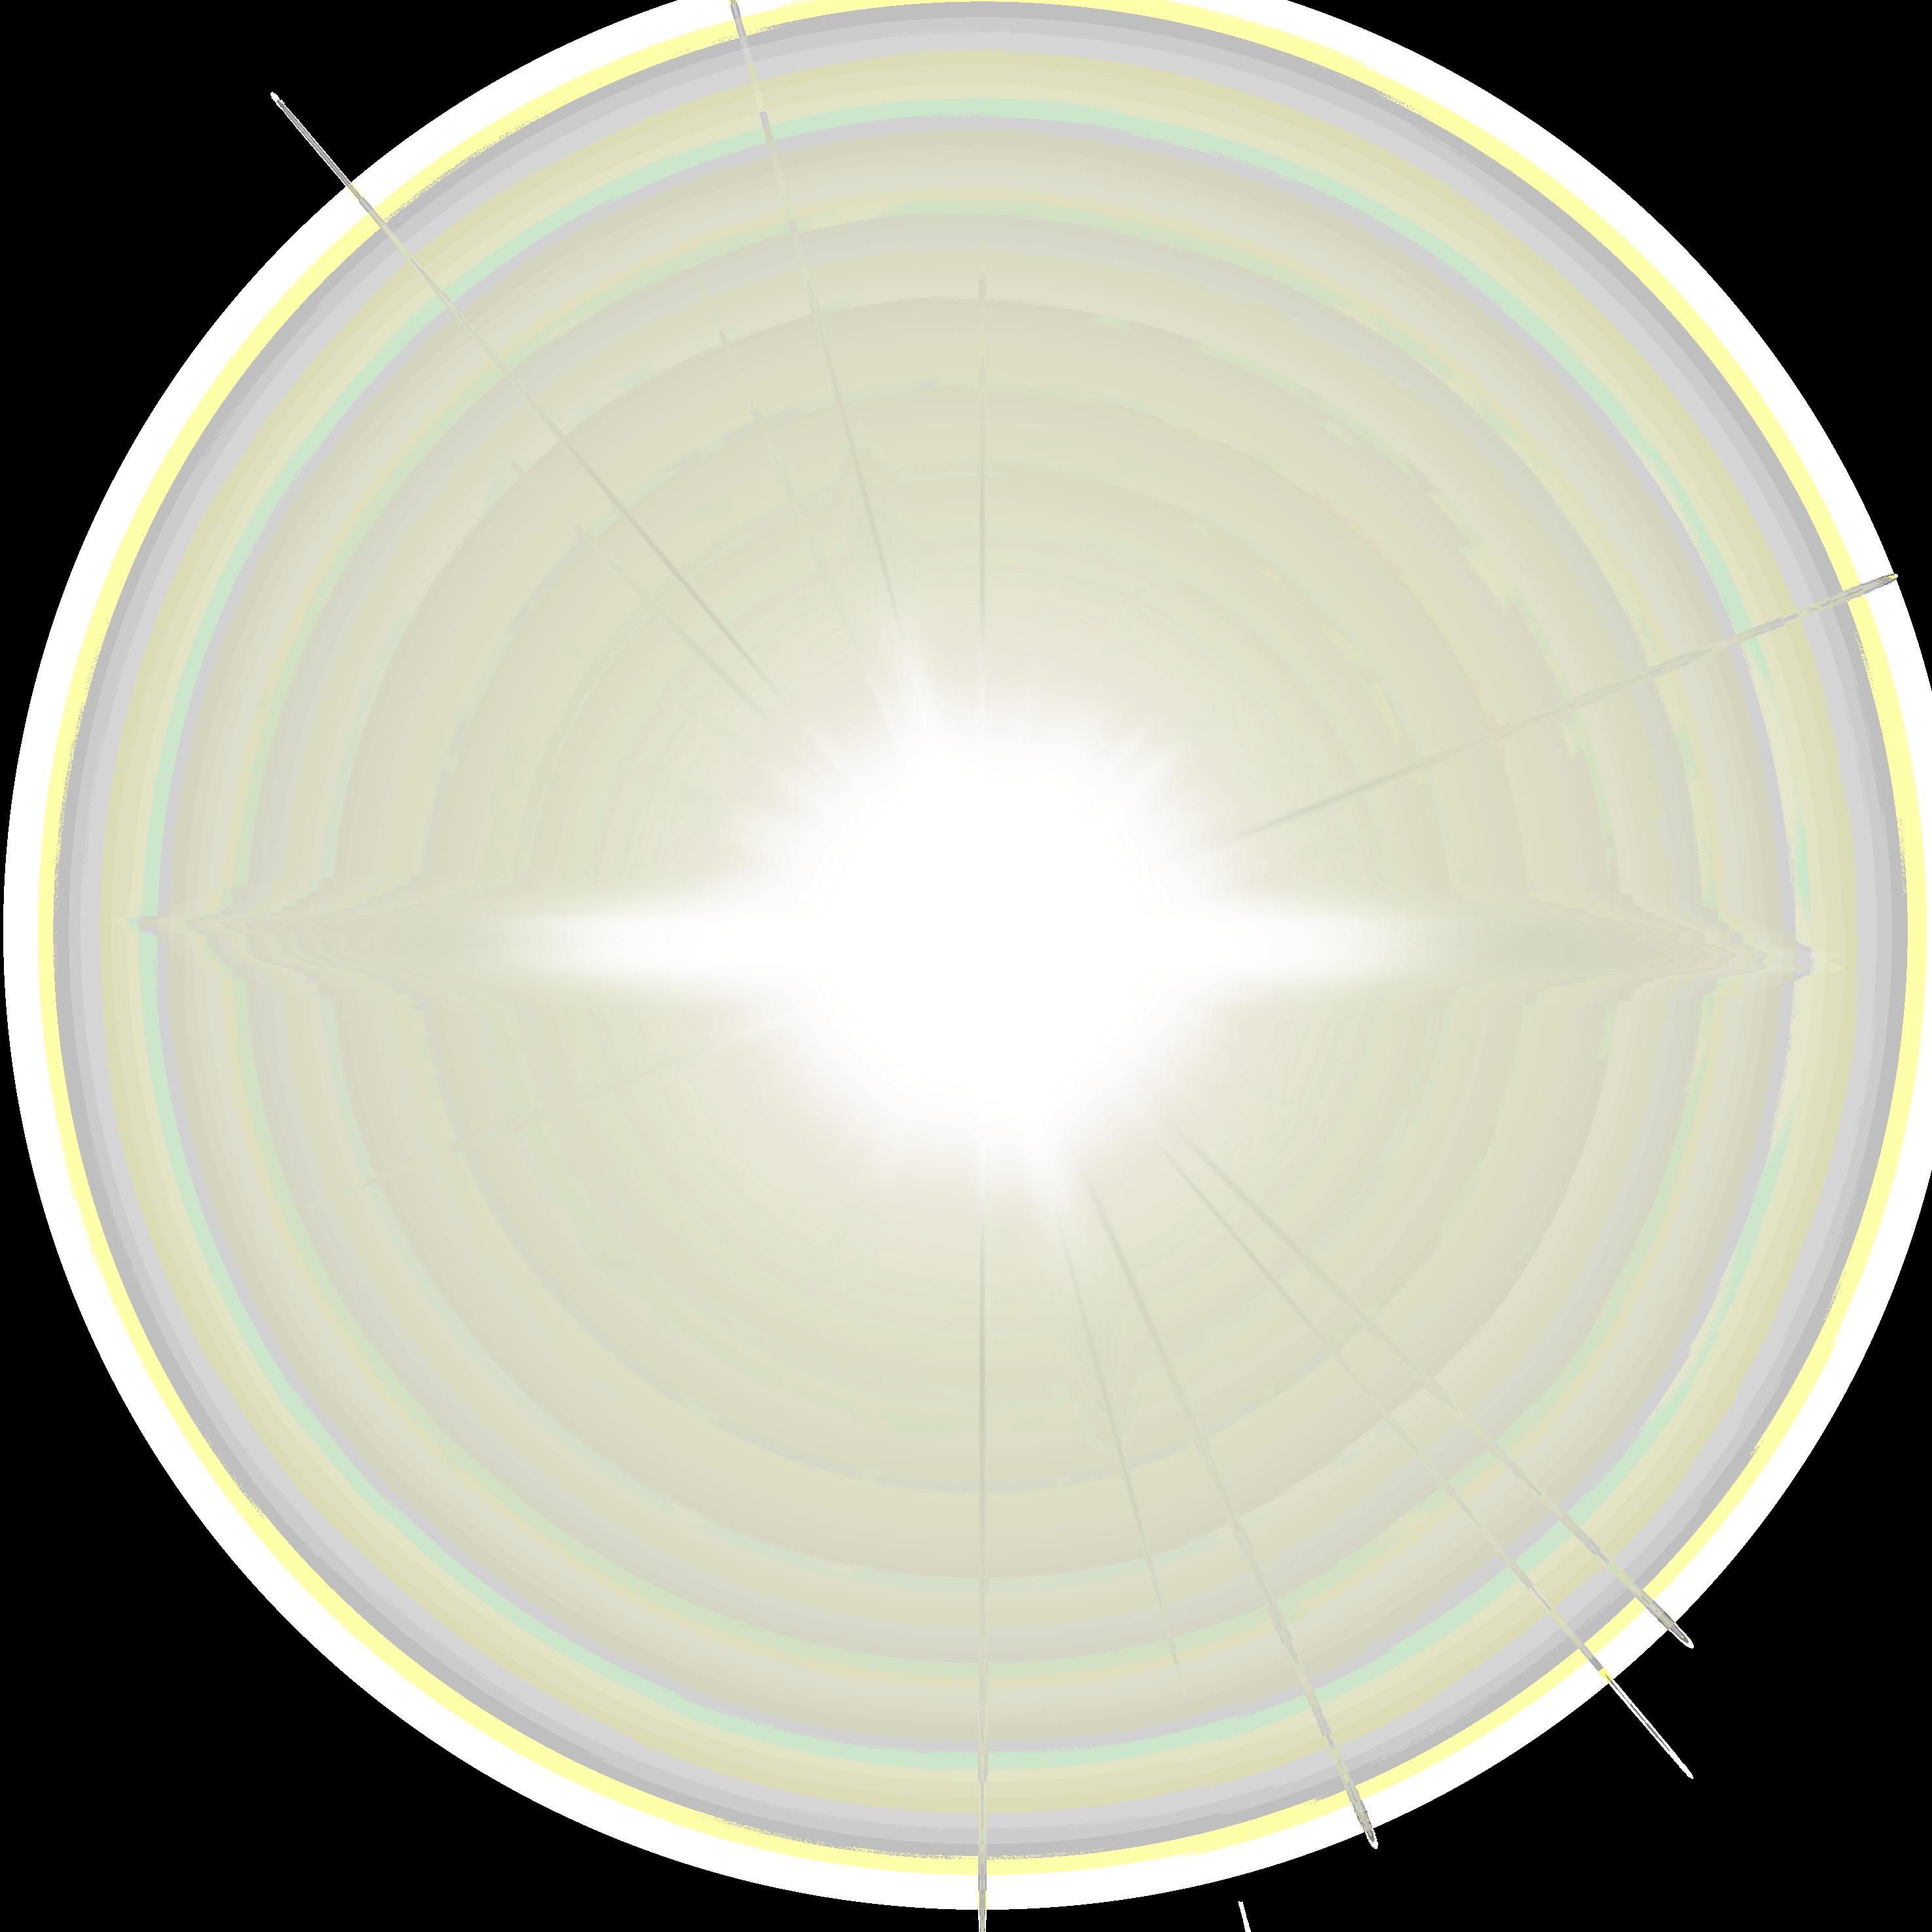 White Lens Flare Png & Free White Lens Flare.png Transparent.